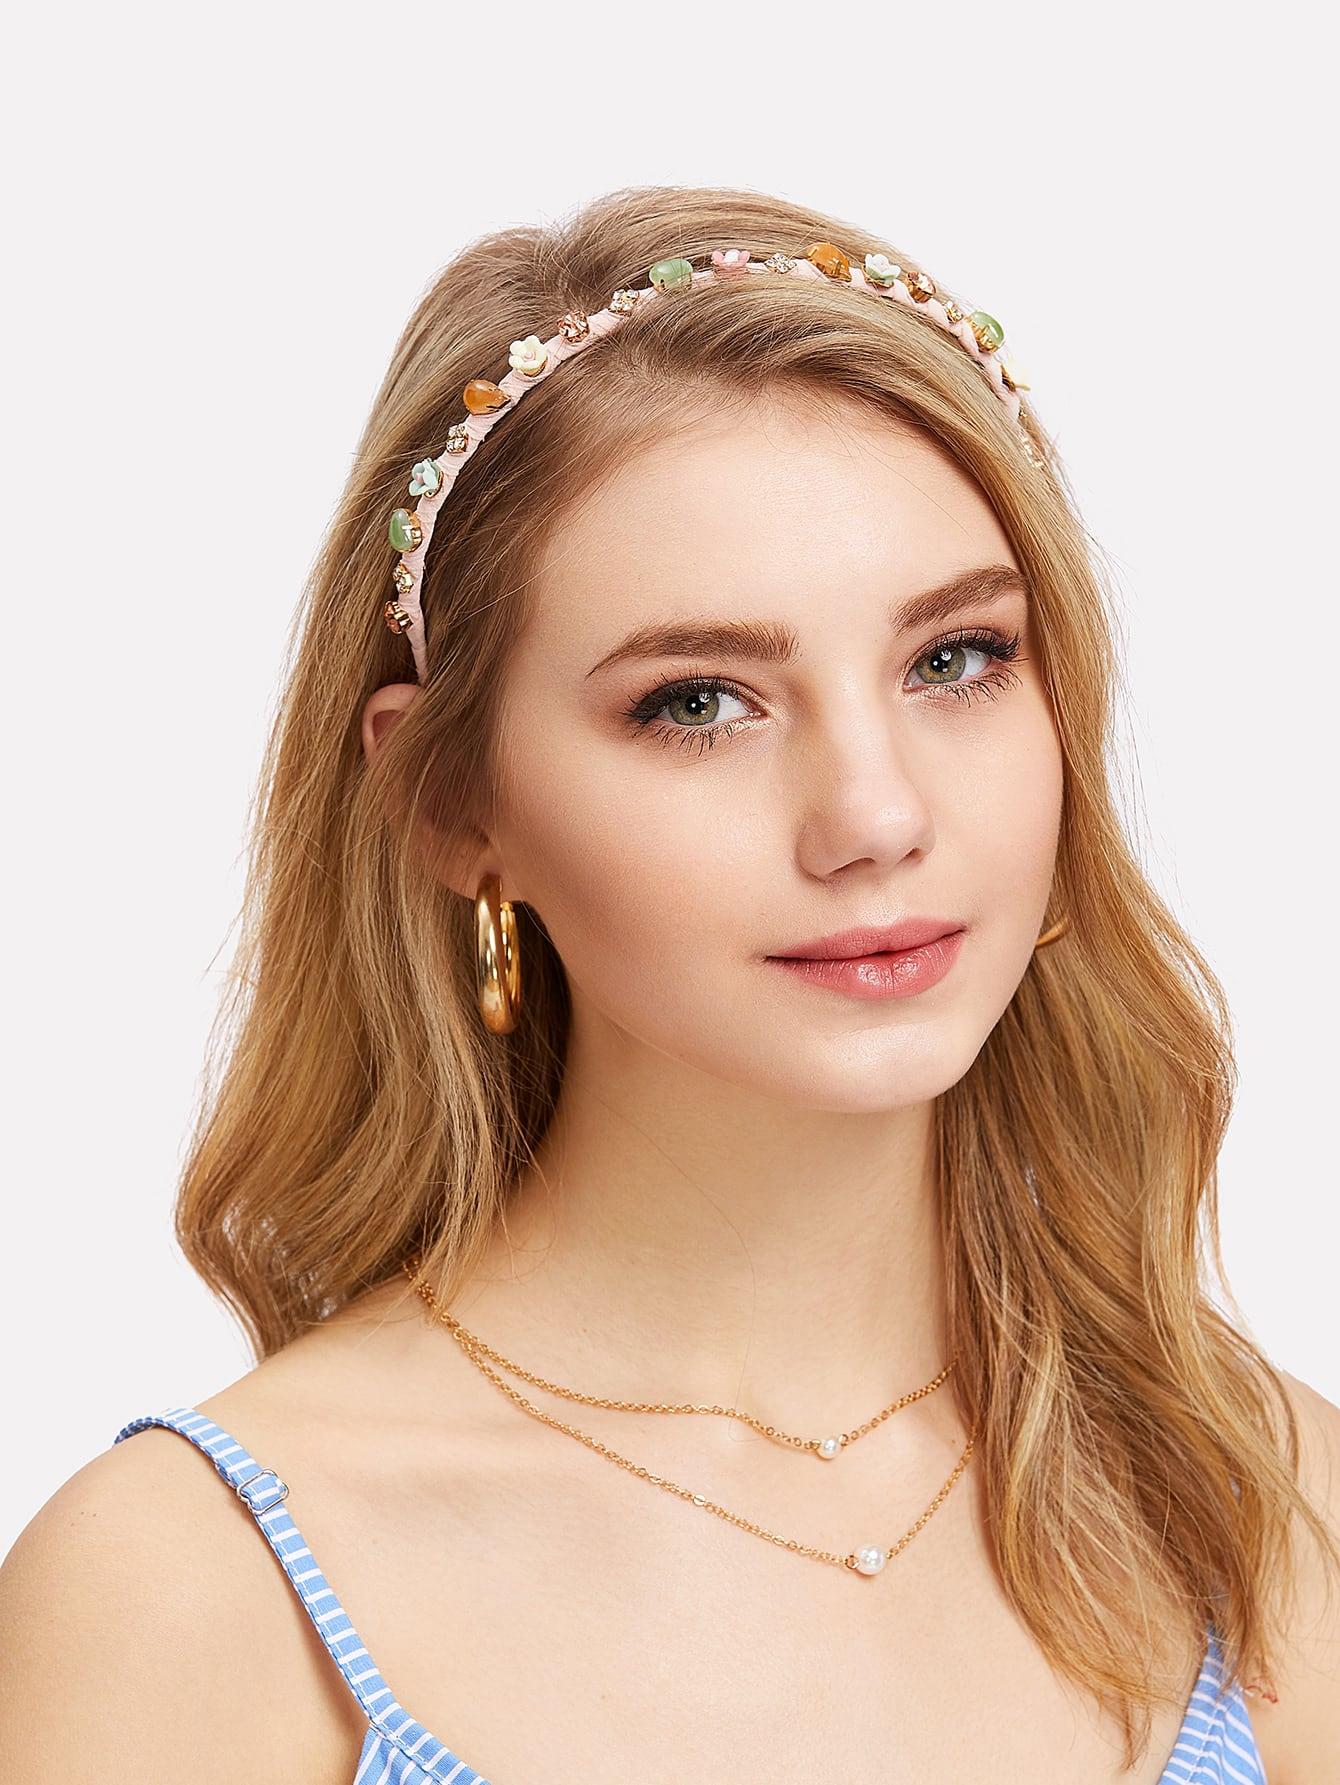 Heart & Flower Decorated Headband